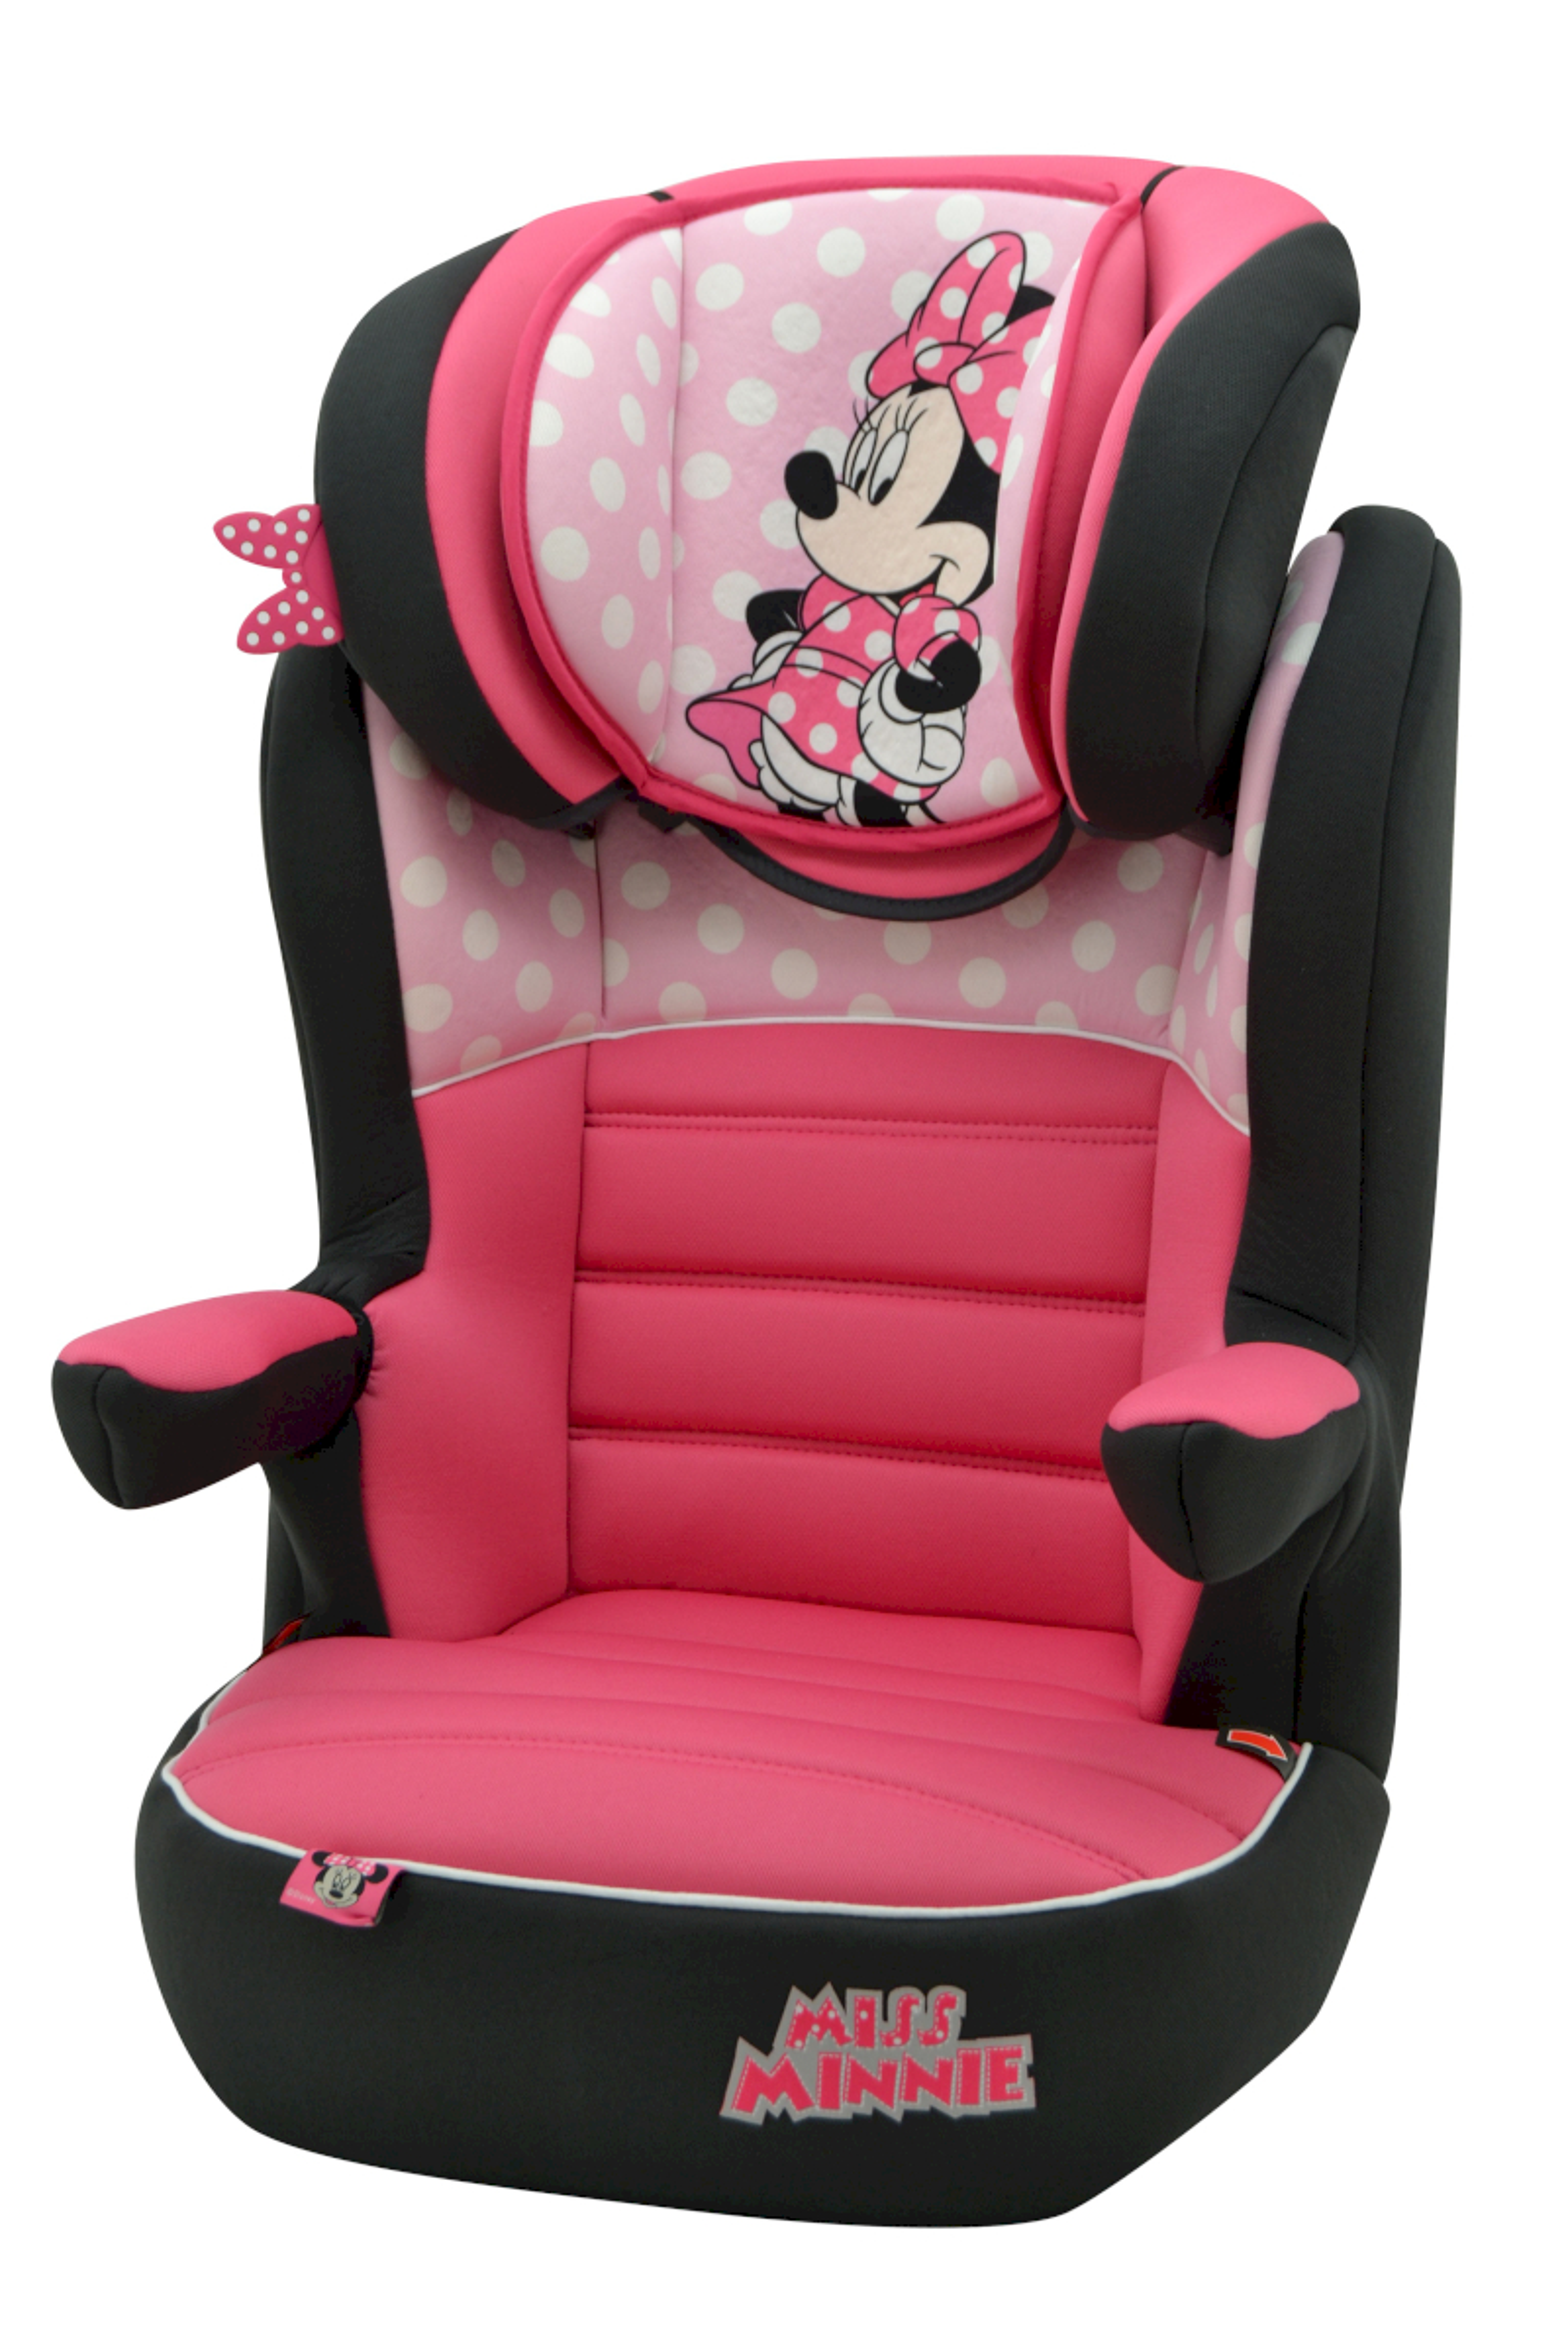 Rivestimento Seggiolino Auto Disney Minnie R-Way